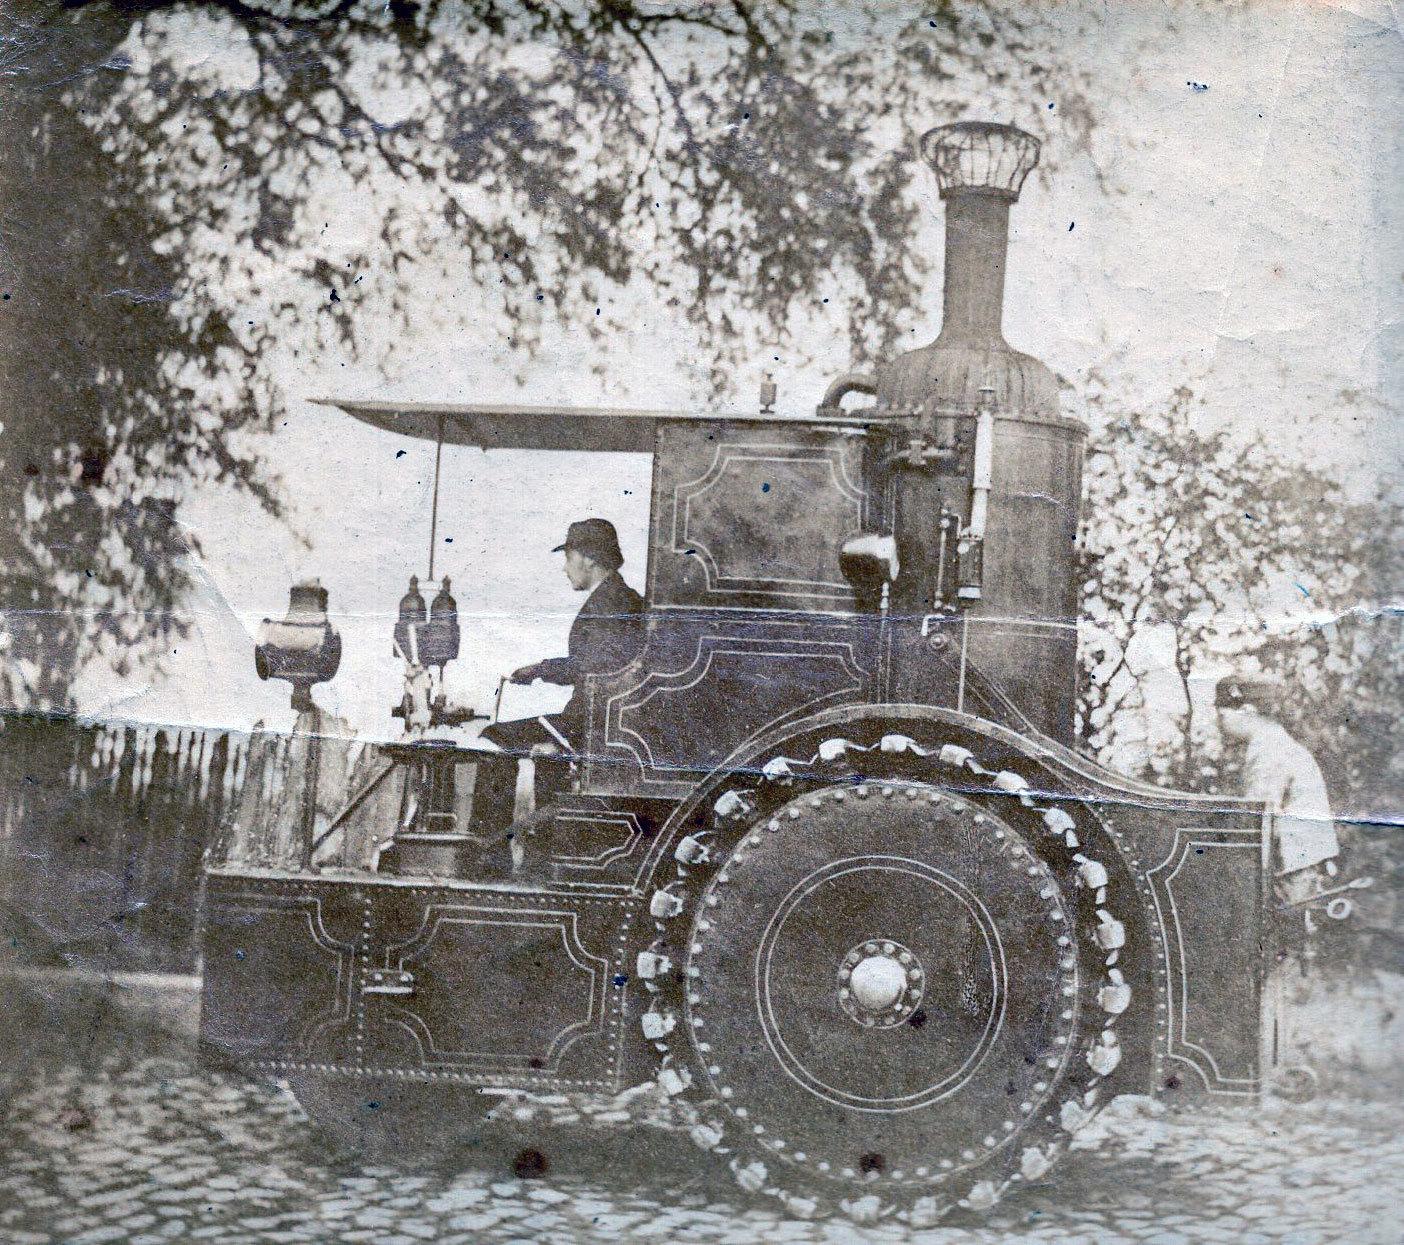 Steam Tractor c.1870